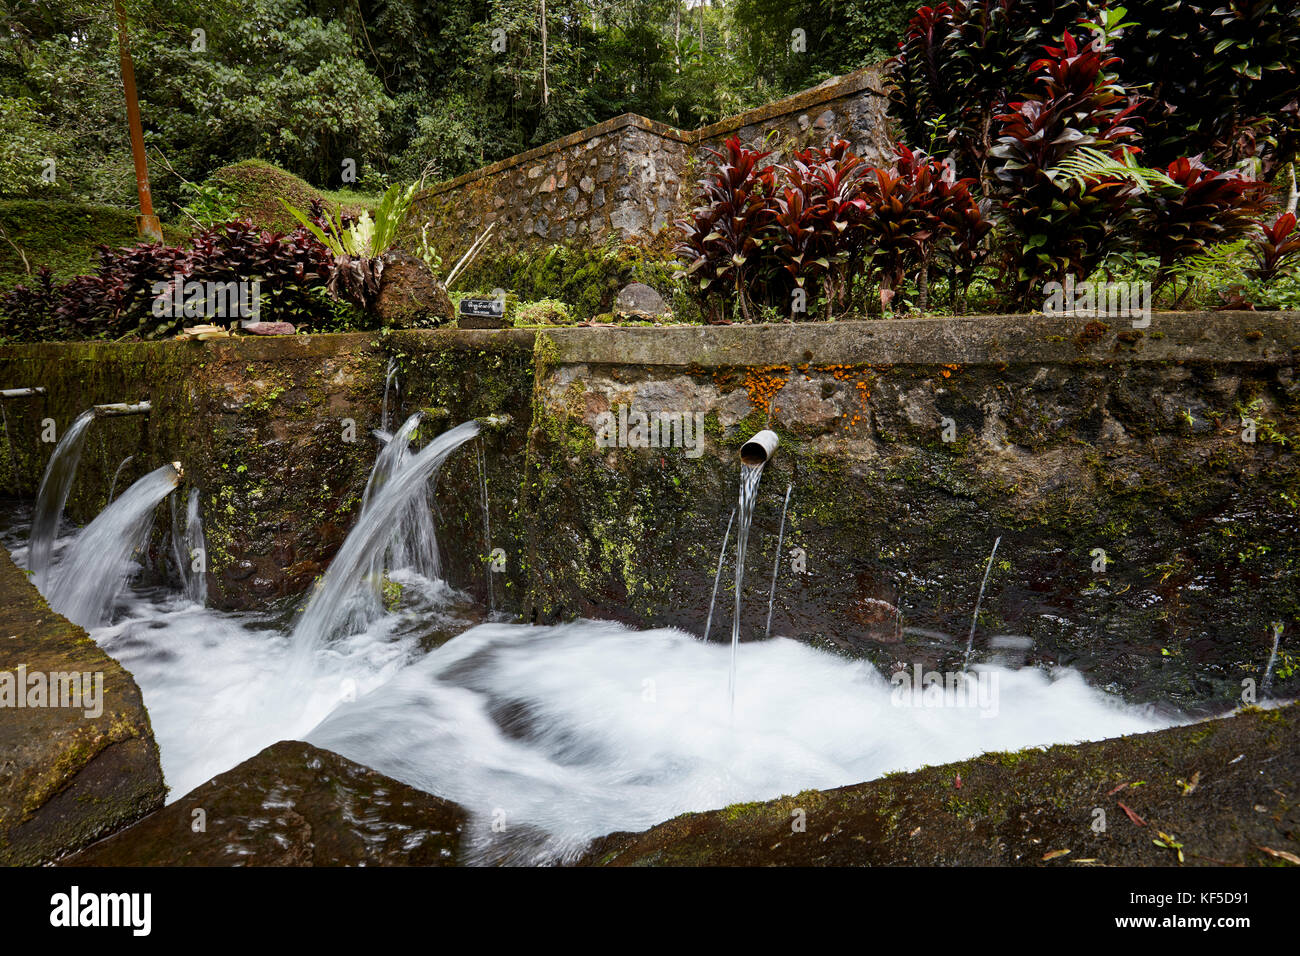 Water springs in the Mengening Temple. Tampaksiring, Bali, Indonesia. - Stock Image